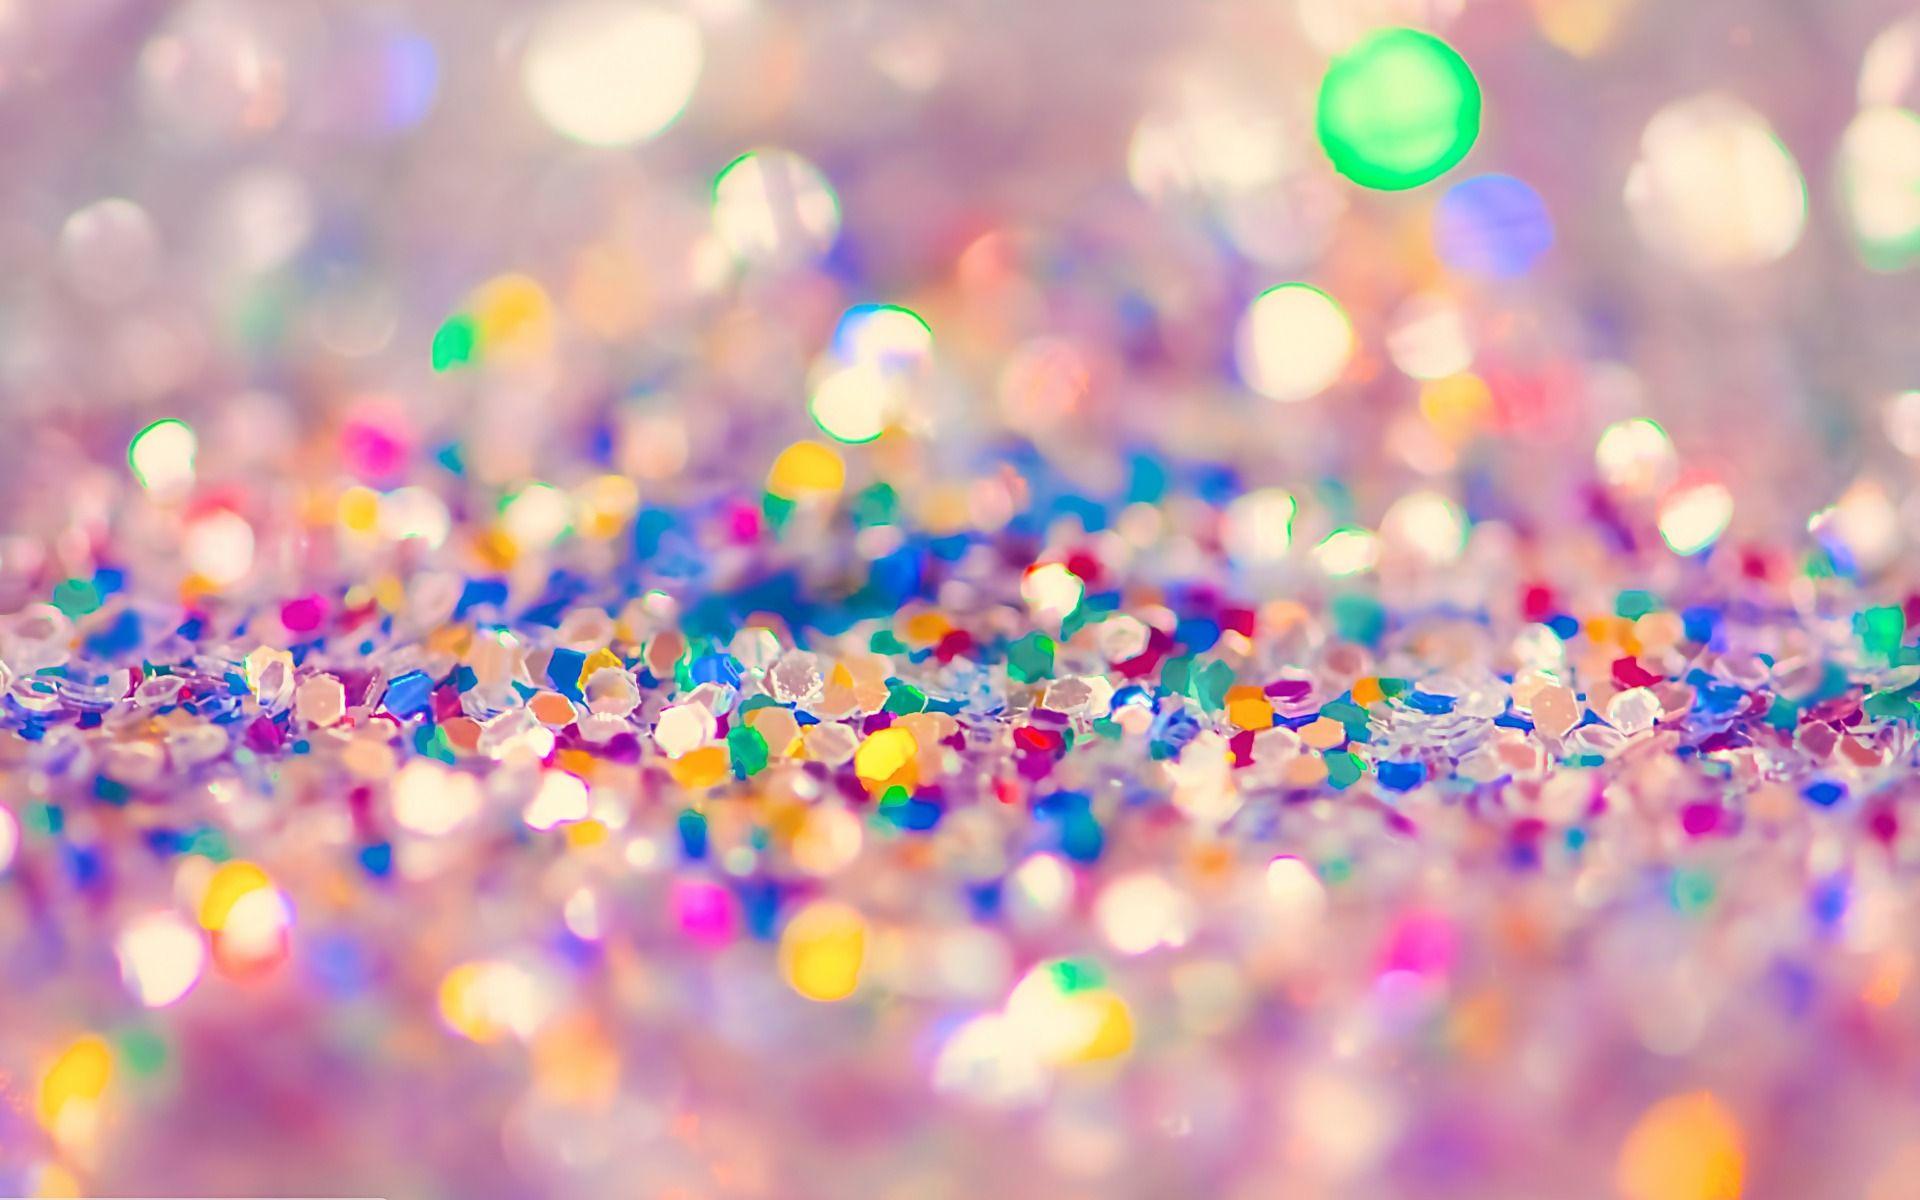 Gold Glitter Desktop Wallpaper - WallpaperSafari